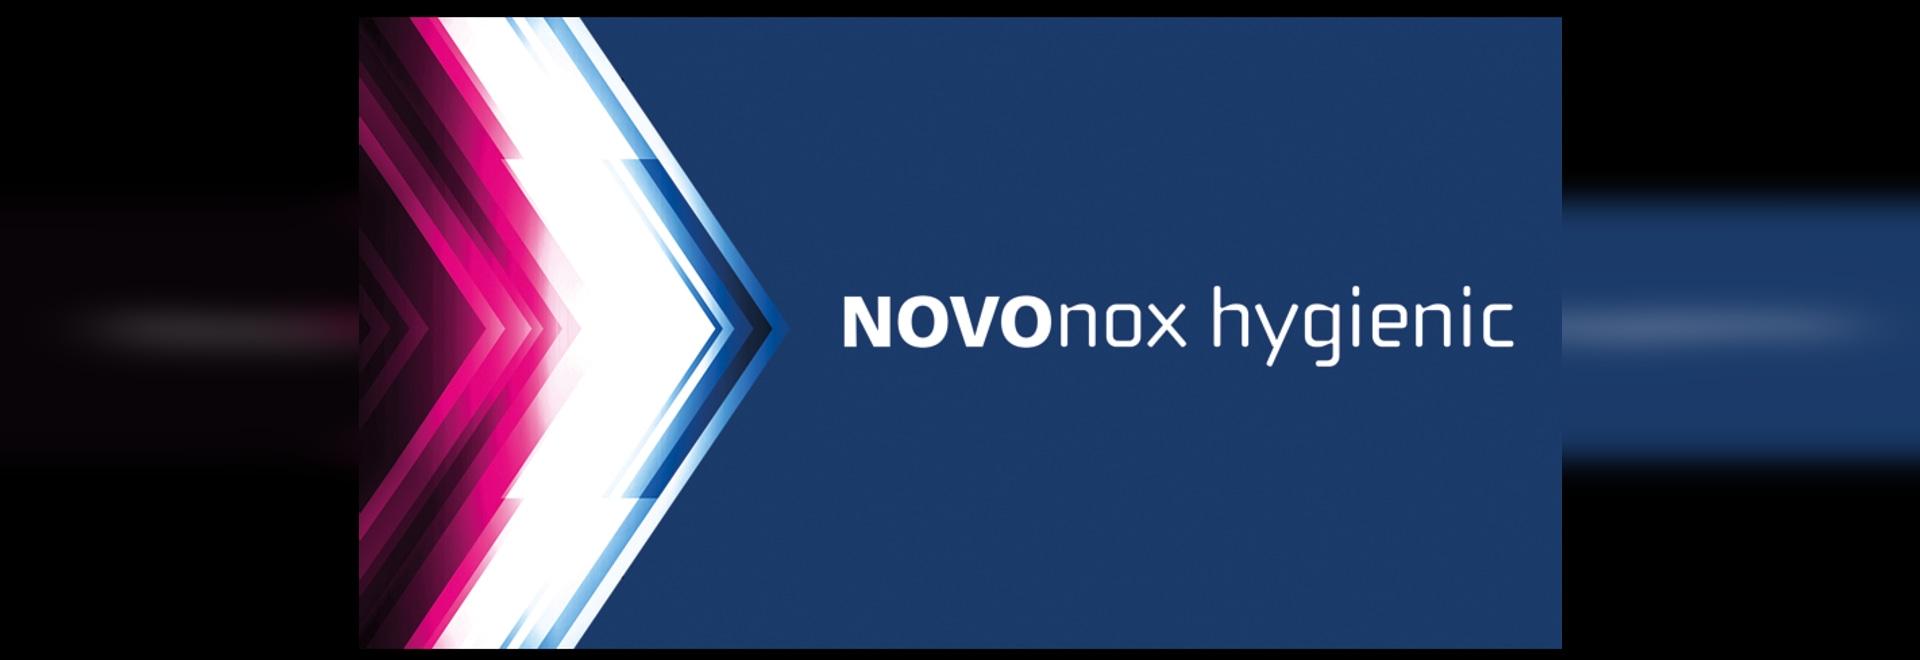 NovoNox est maintenant NOVOnox hygiénique